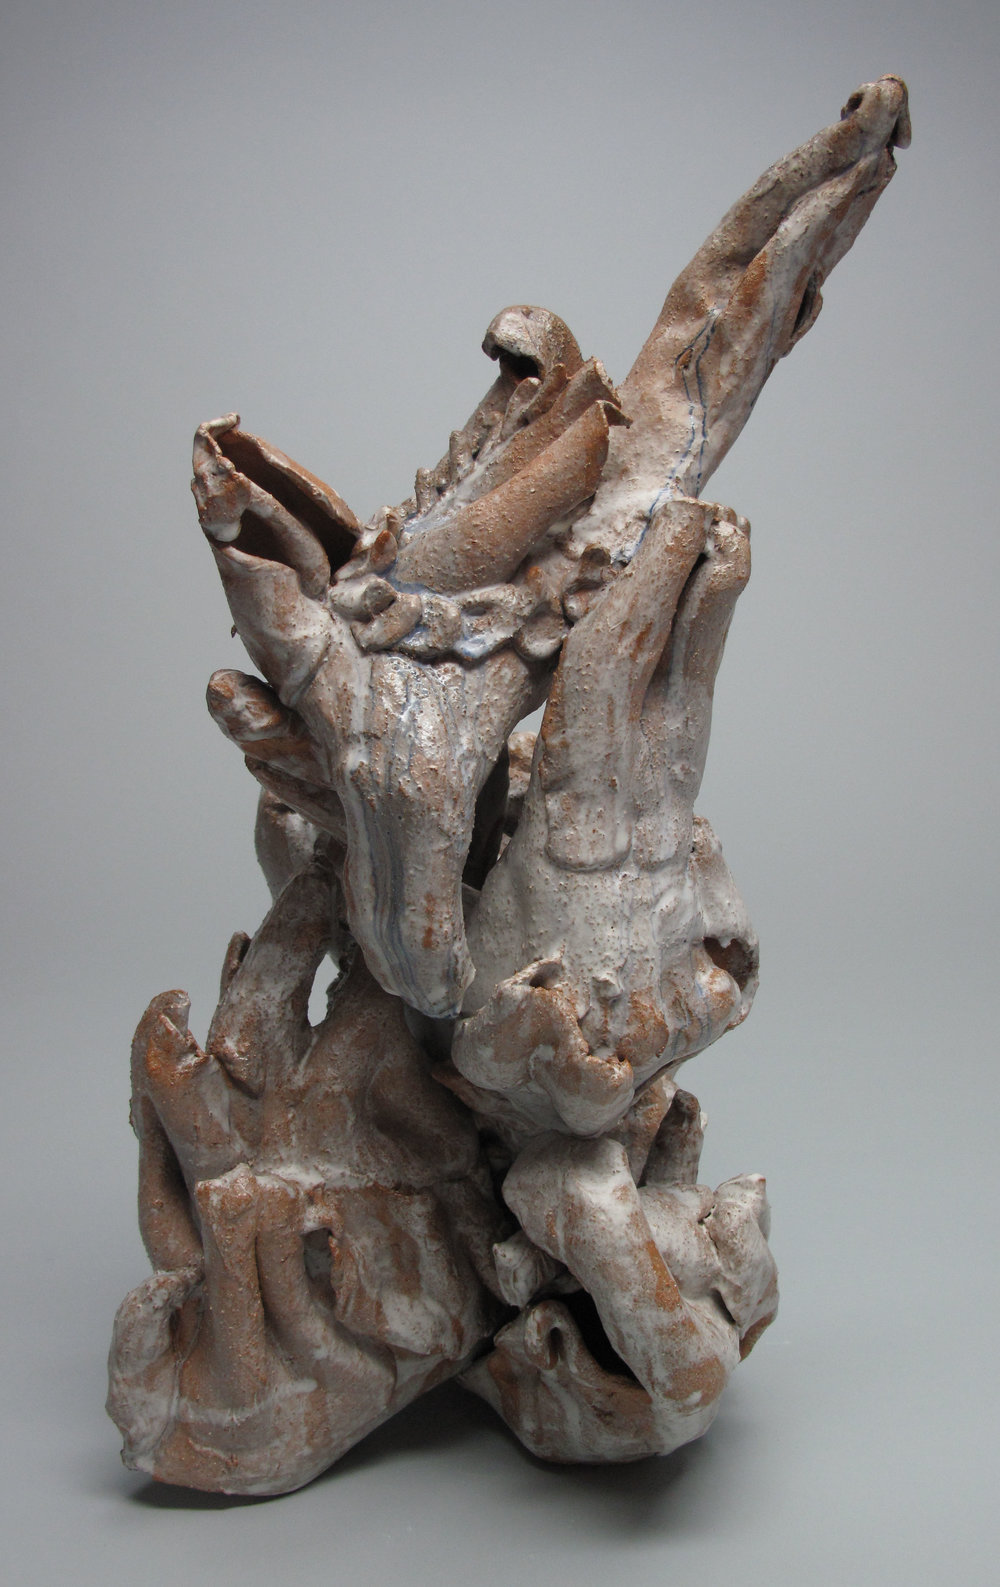 Sara Fine-Wilson, Point , Stoneware, 14x10x8